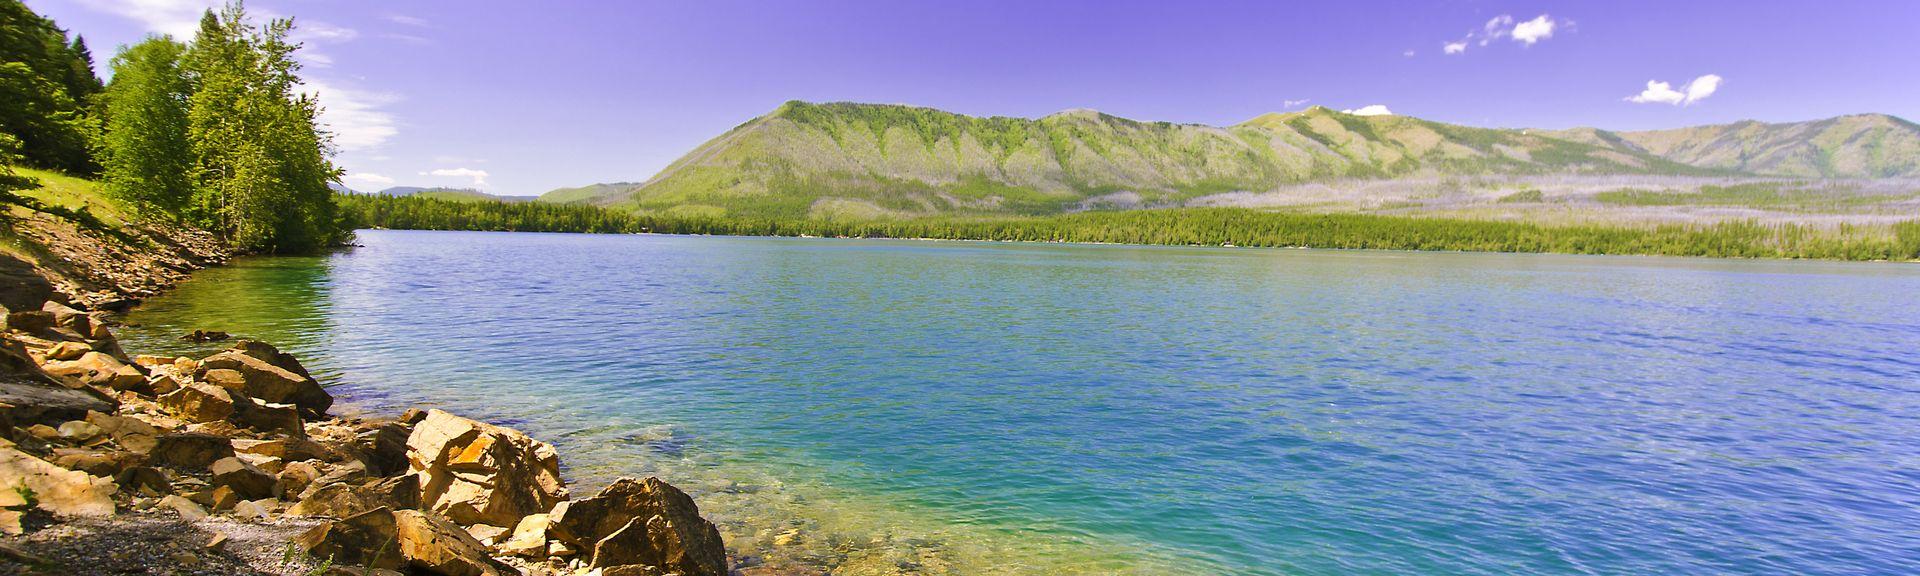 Flathead Lake, MT, USA